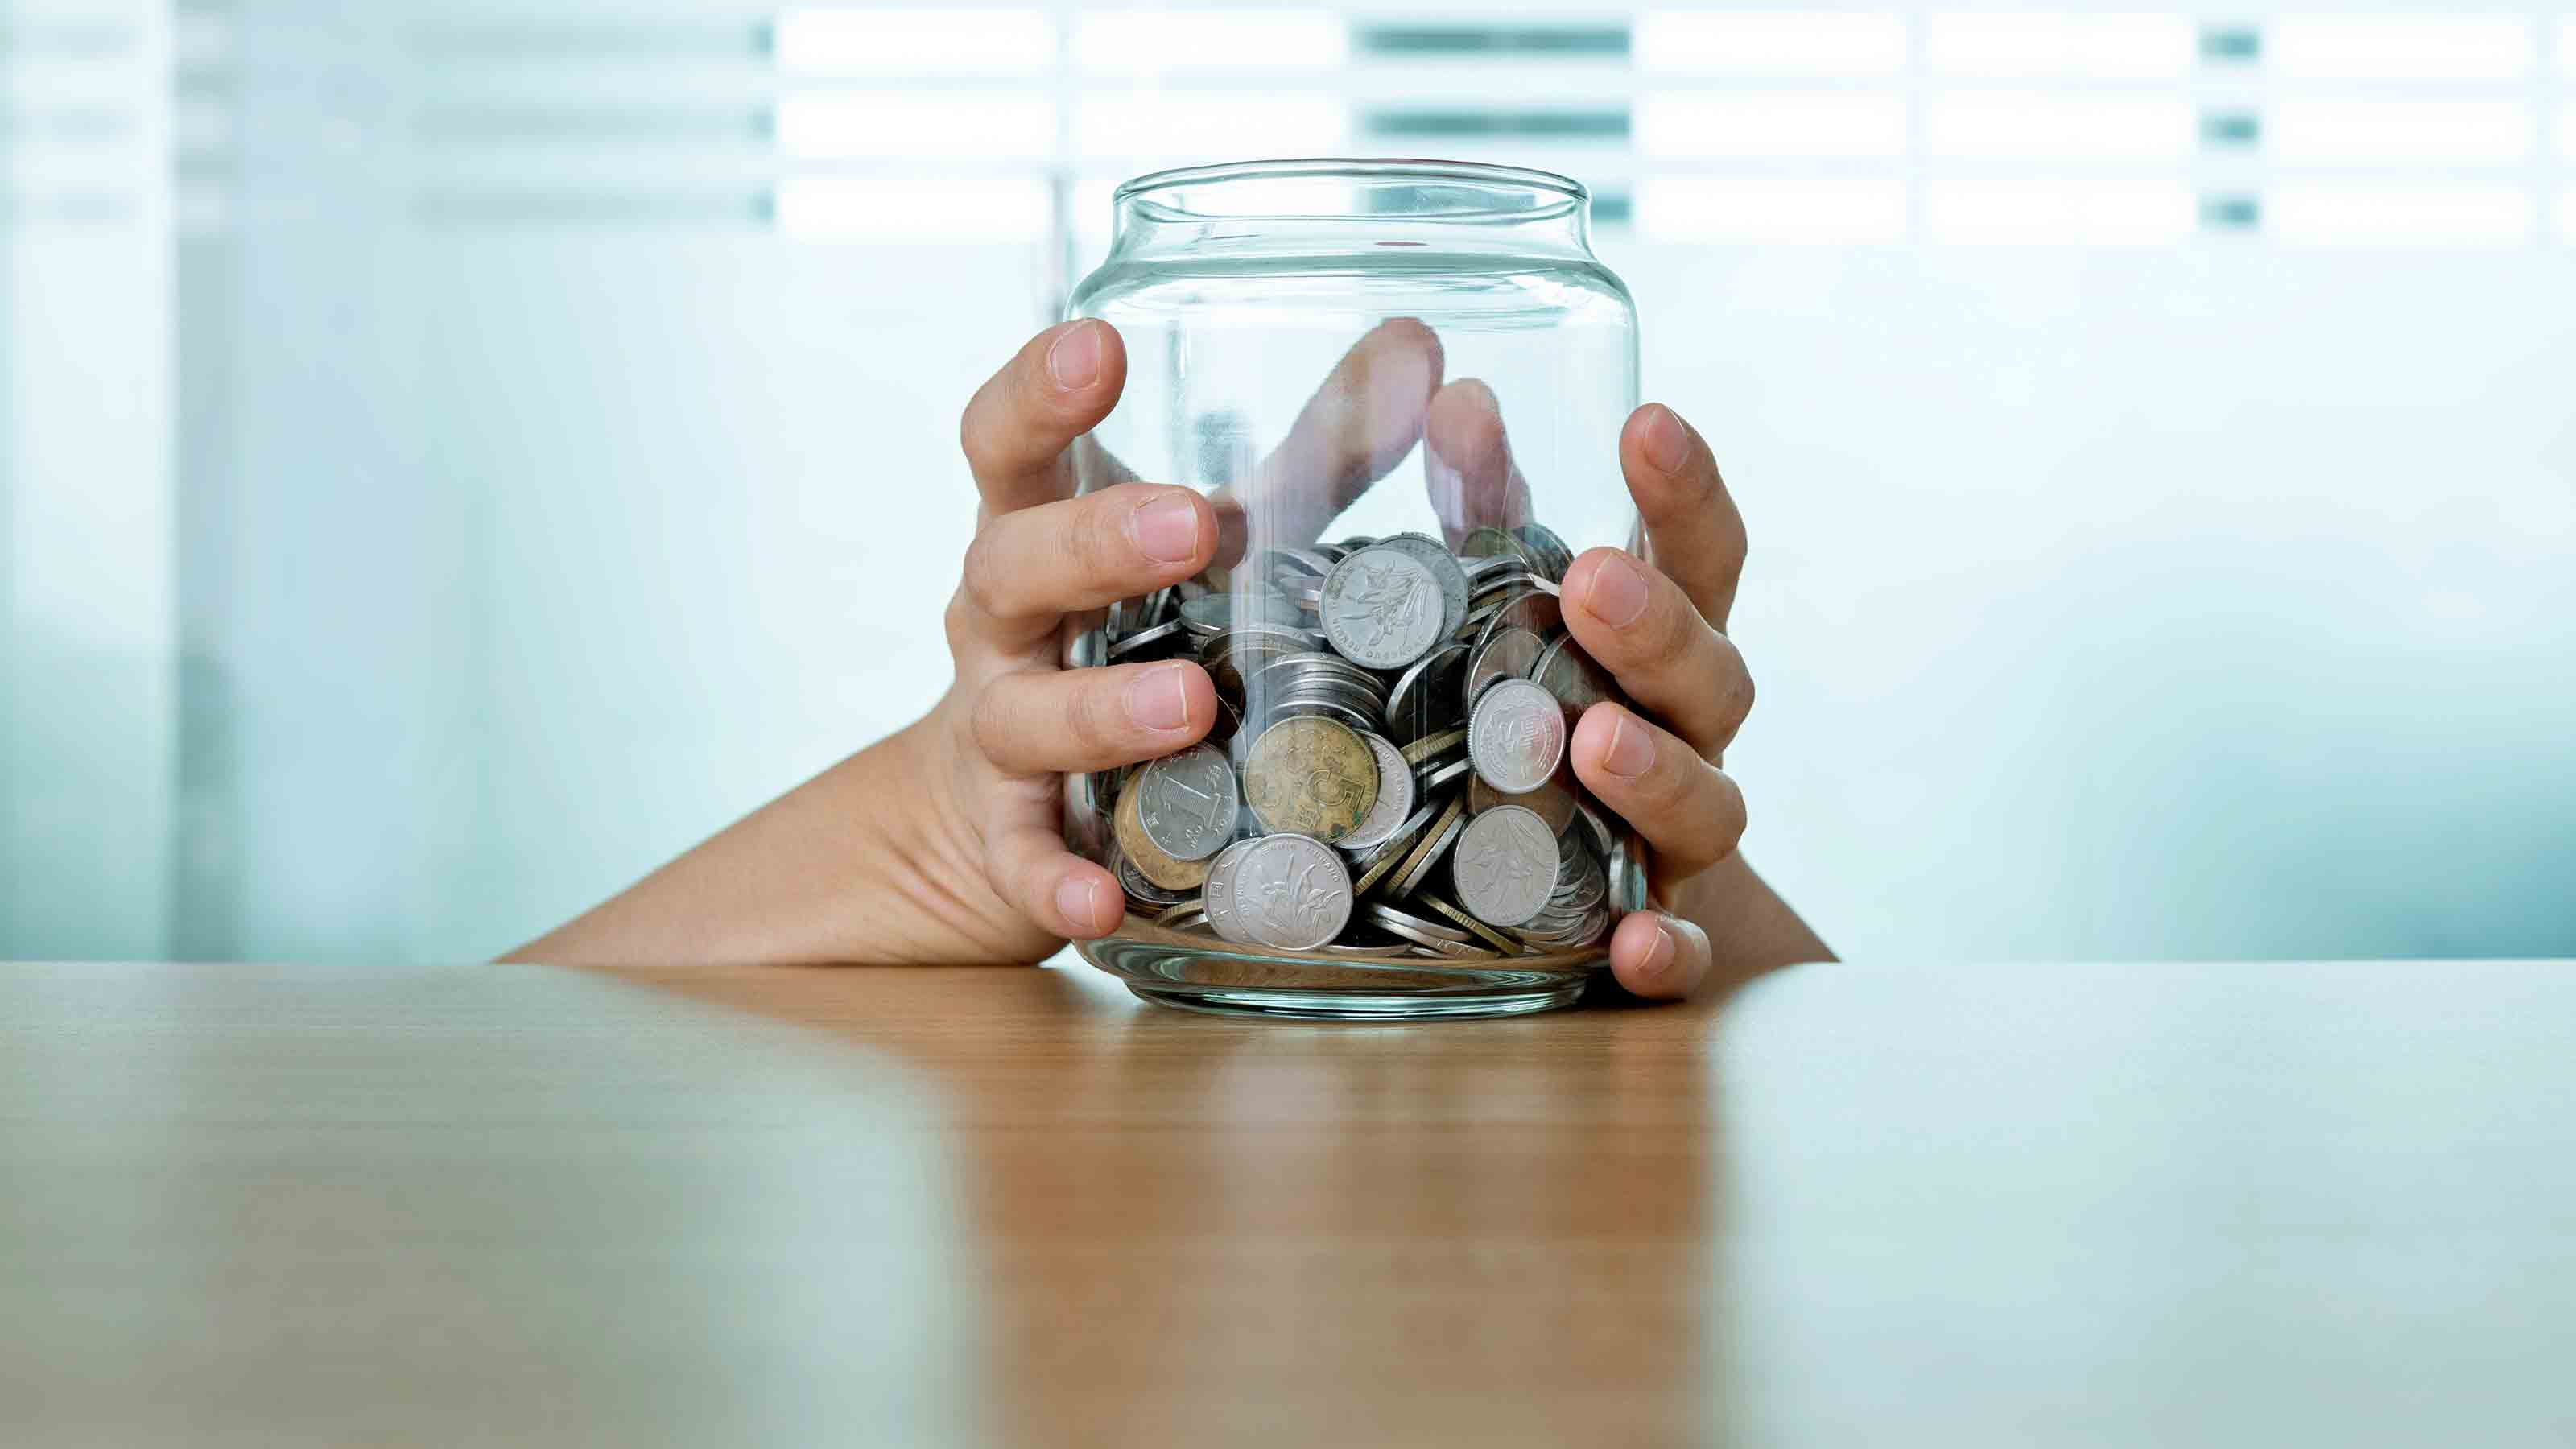 How to Avoid a Charity Scam | Kiplinger